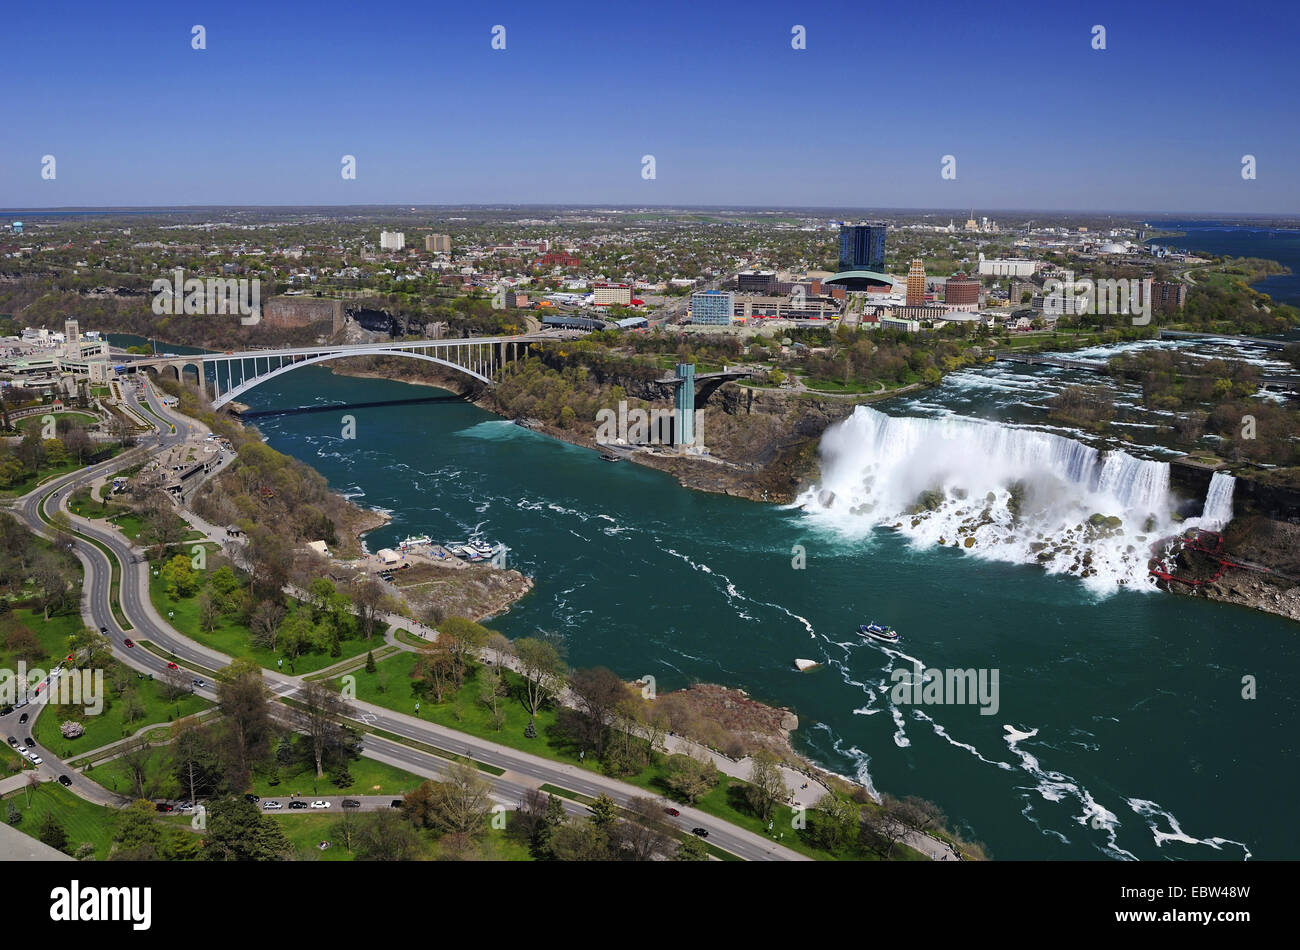 Top Hotels In Niagara Falls Ontario